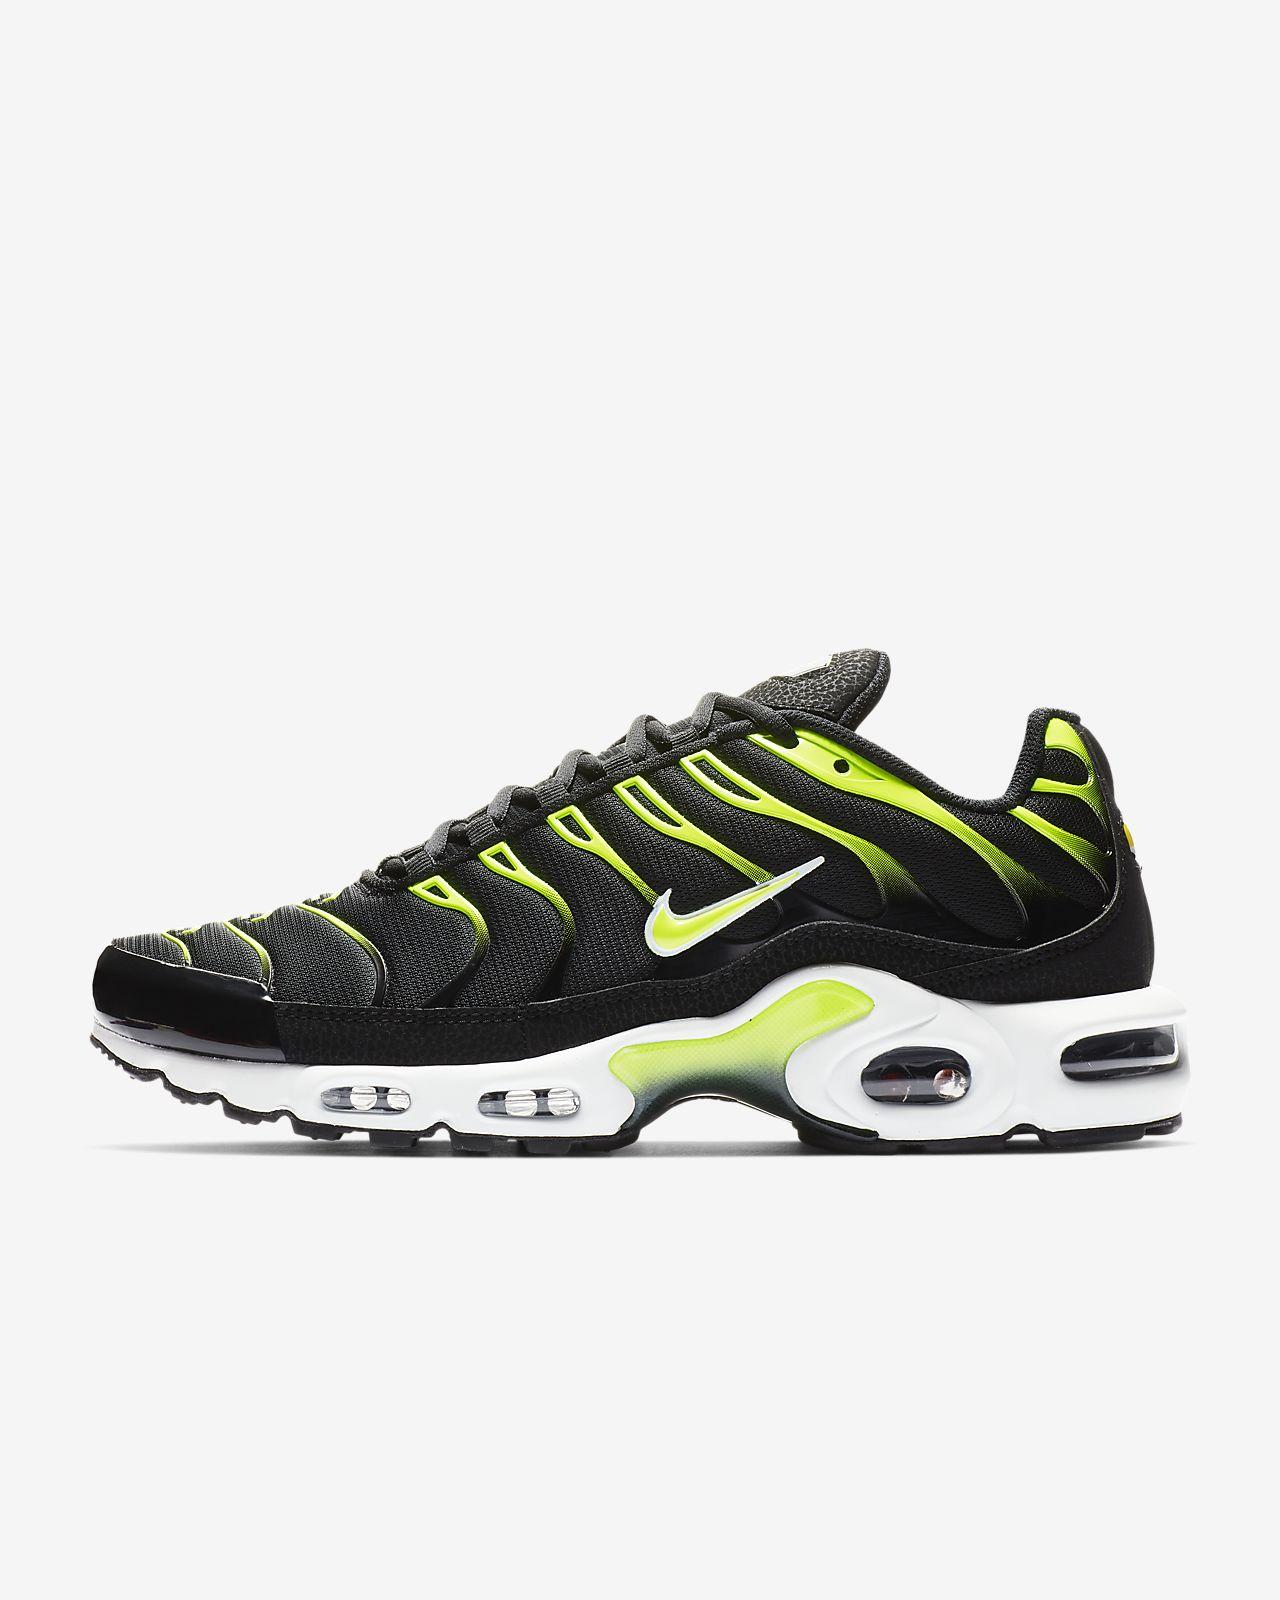 outlet store 437c3 7f4bc ... Nike Air Max Plus Erkek Ayakkabısı